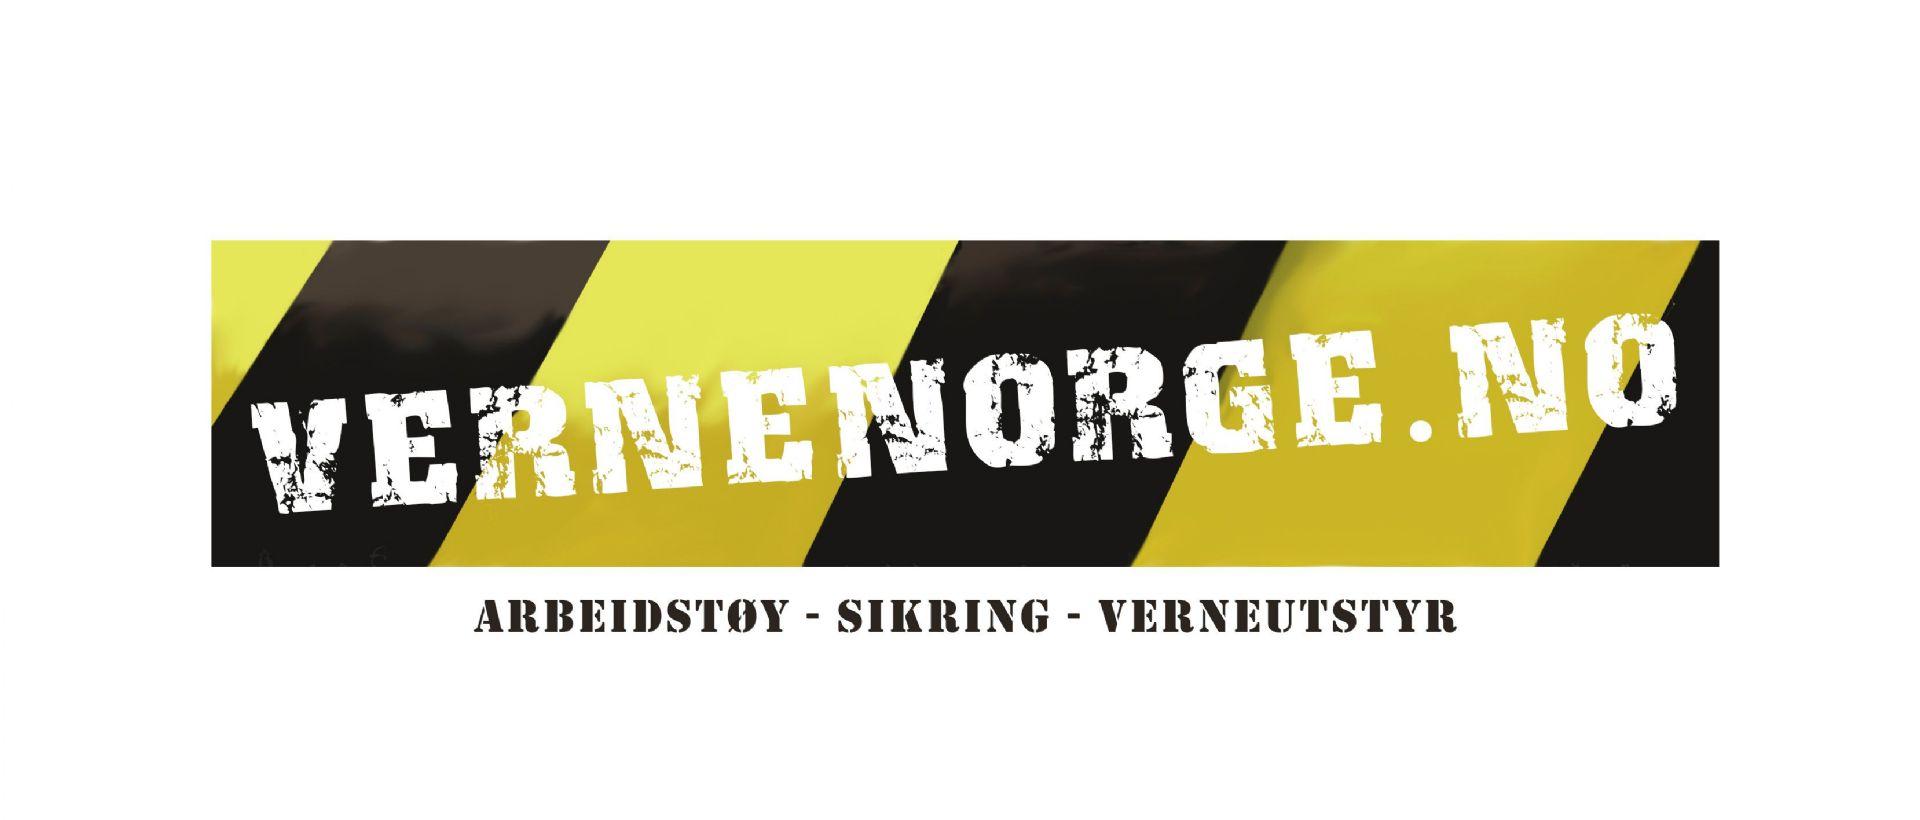 00e554aa8 GAF - VerneNorge